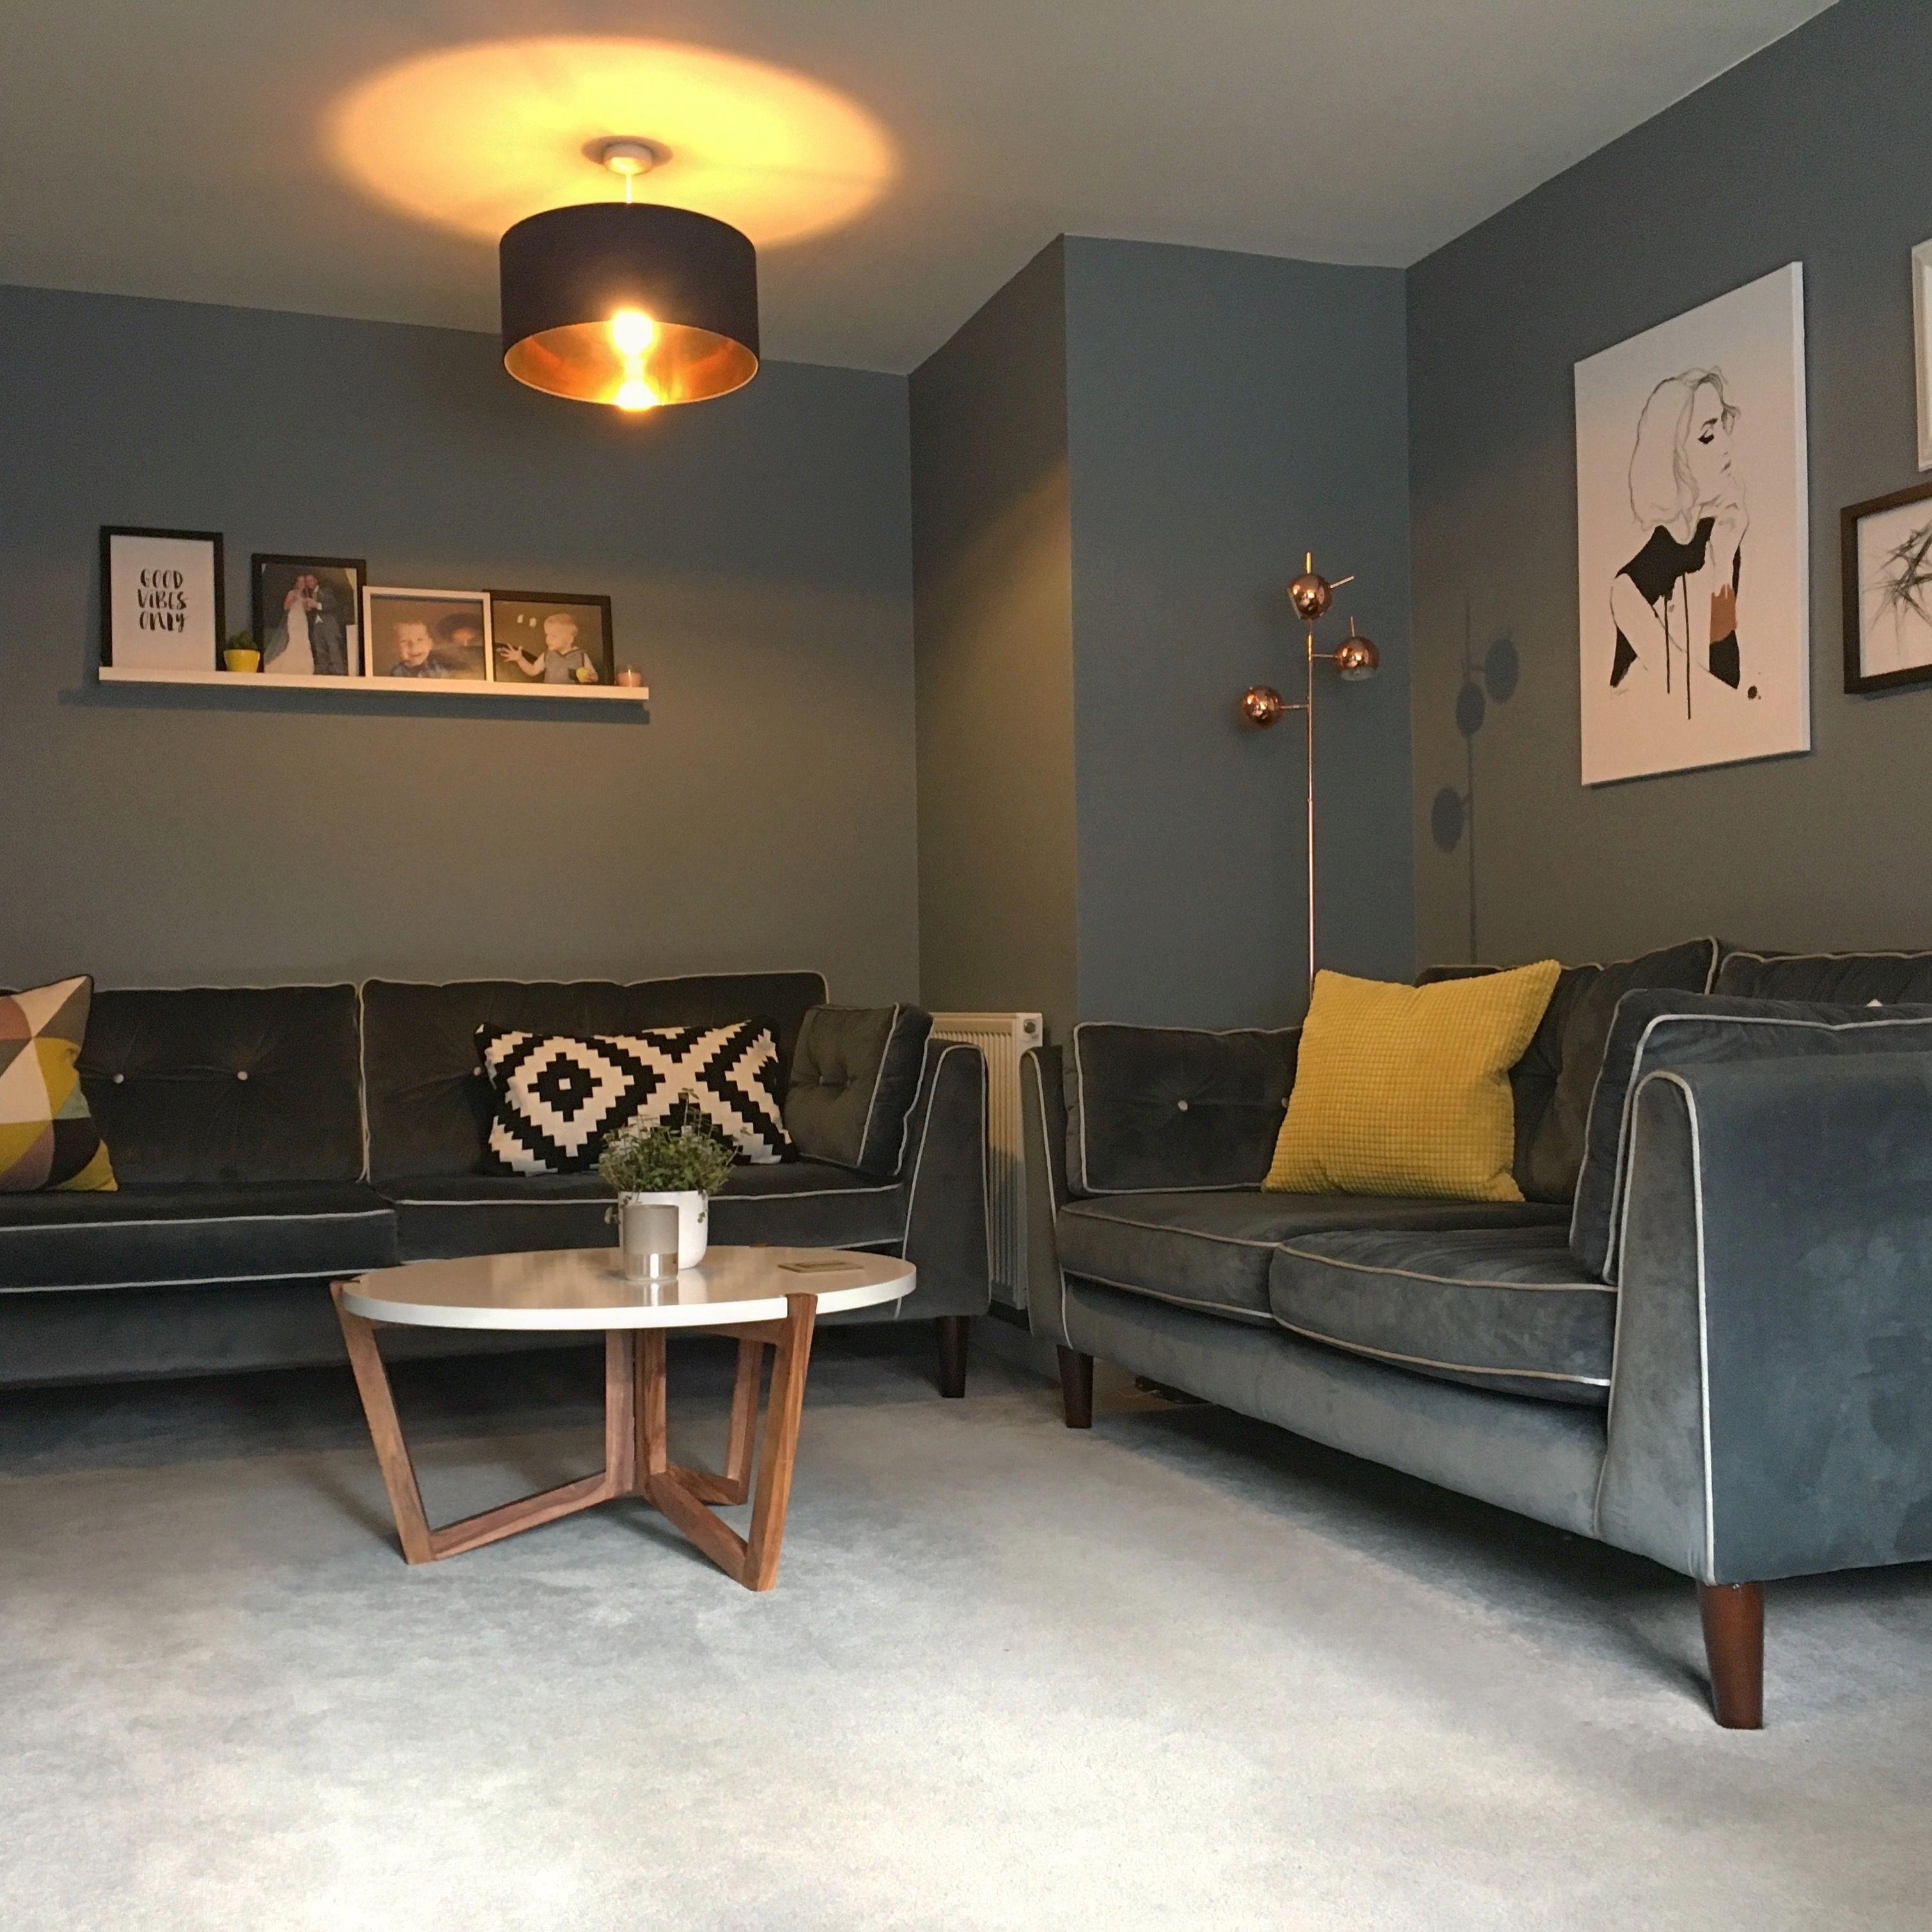 My Living Room Denim Drift By Dulux Livingroomsofacolour Denim Drift Living Room Living Room Furnishings Living Room Throws #paint #my #living #room